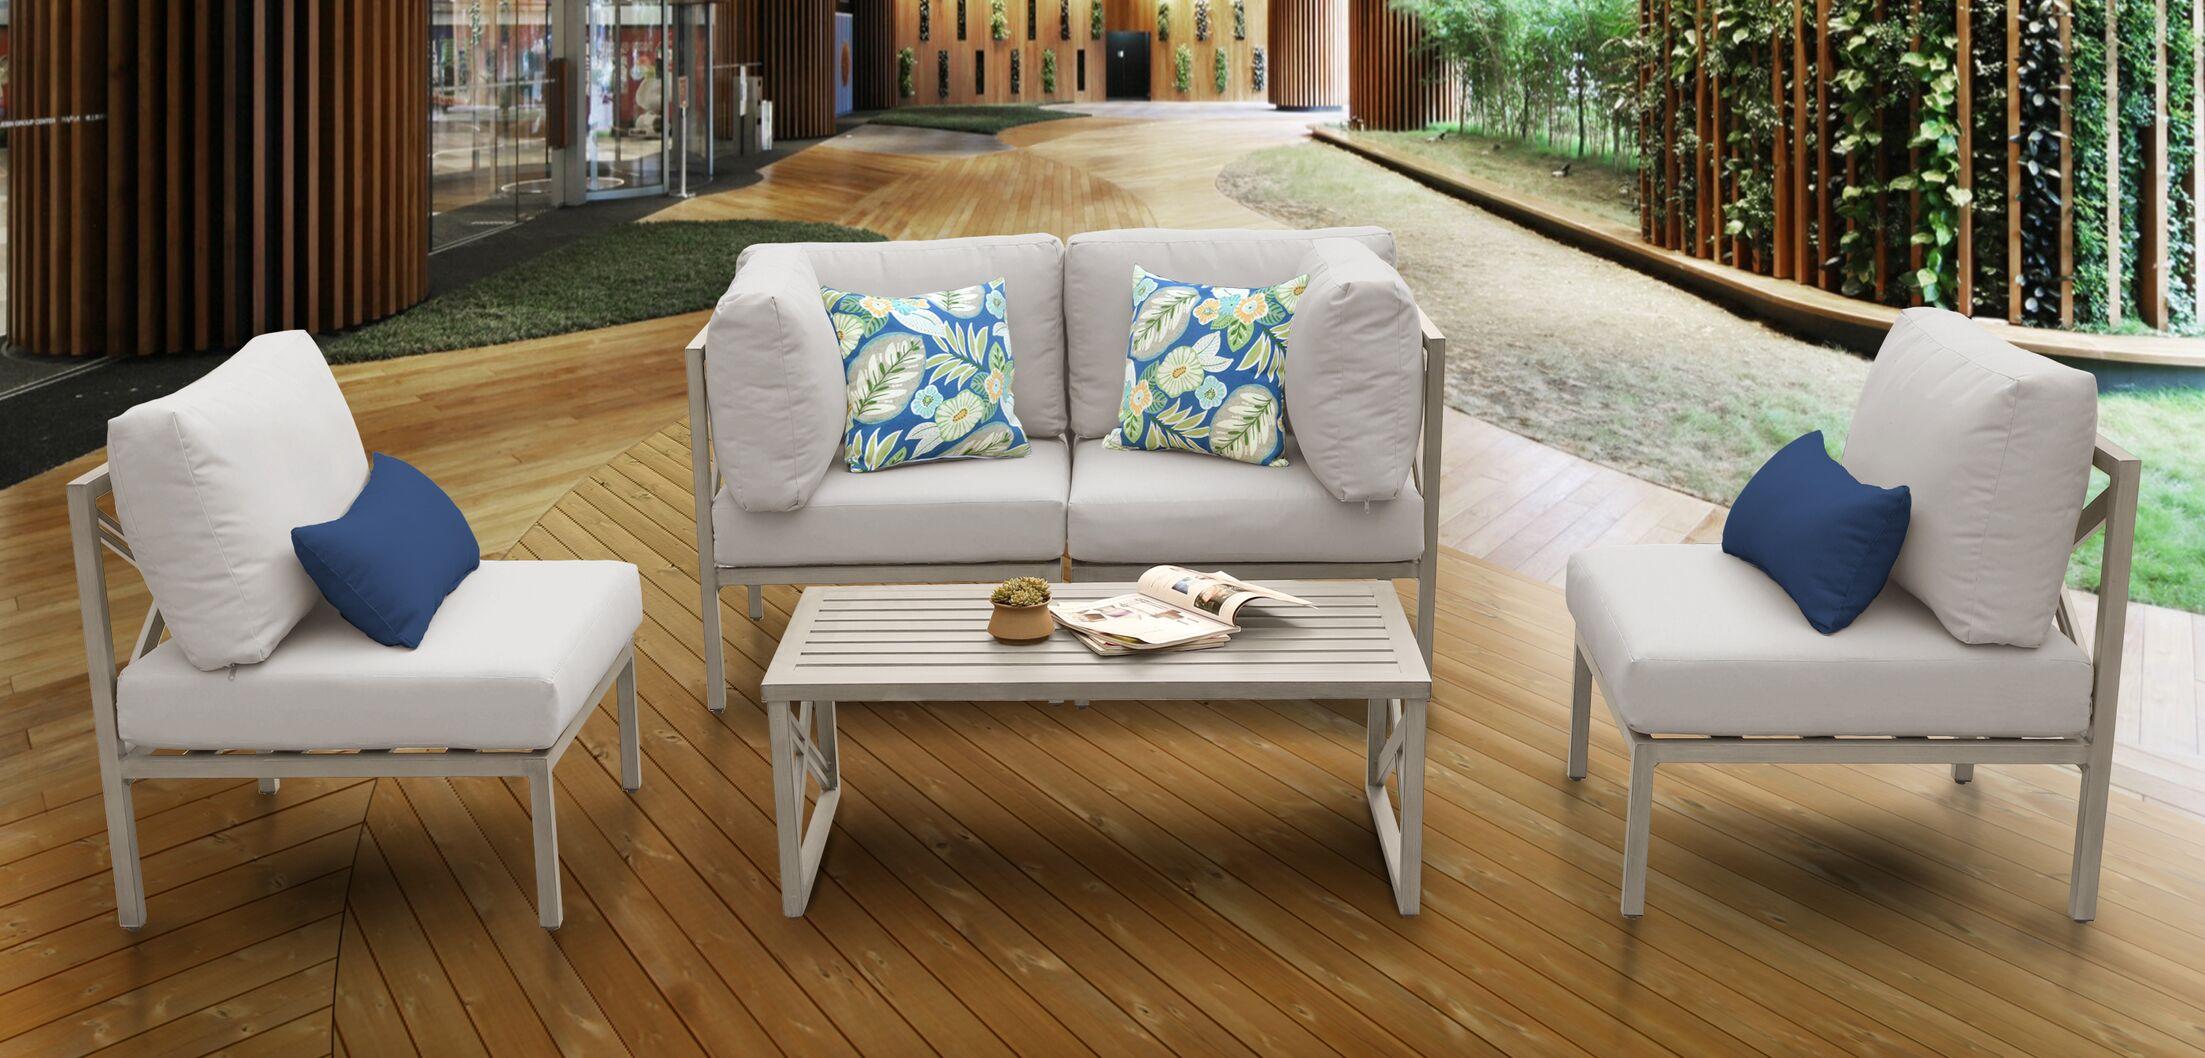 Carlisle 5 Piece Sofa Set with Cushions Cushion Color: Beige